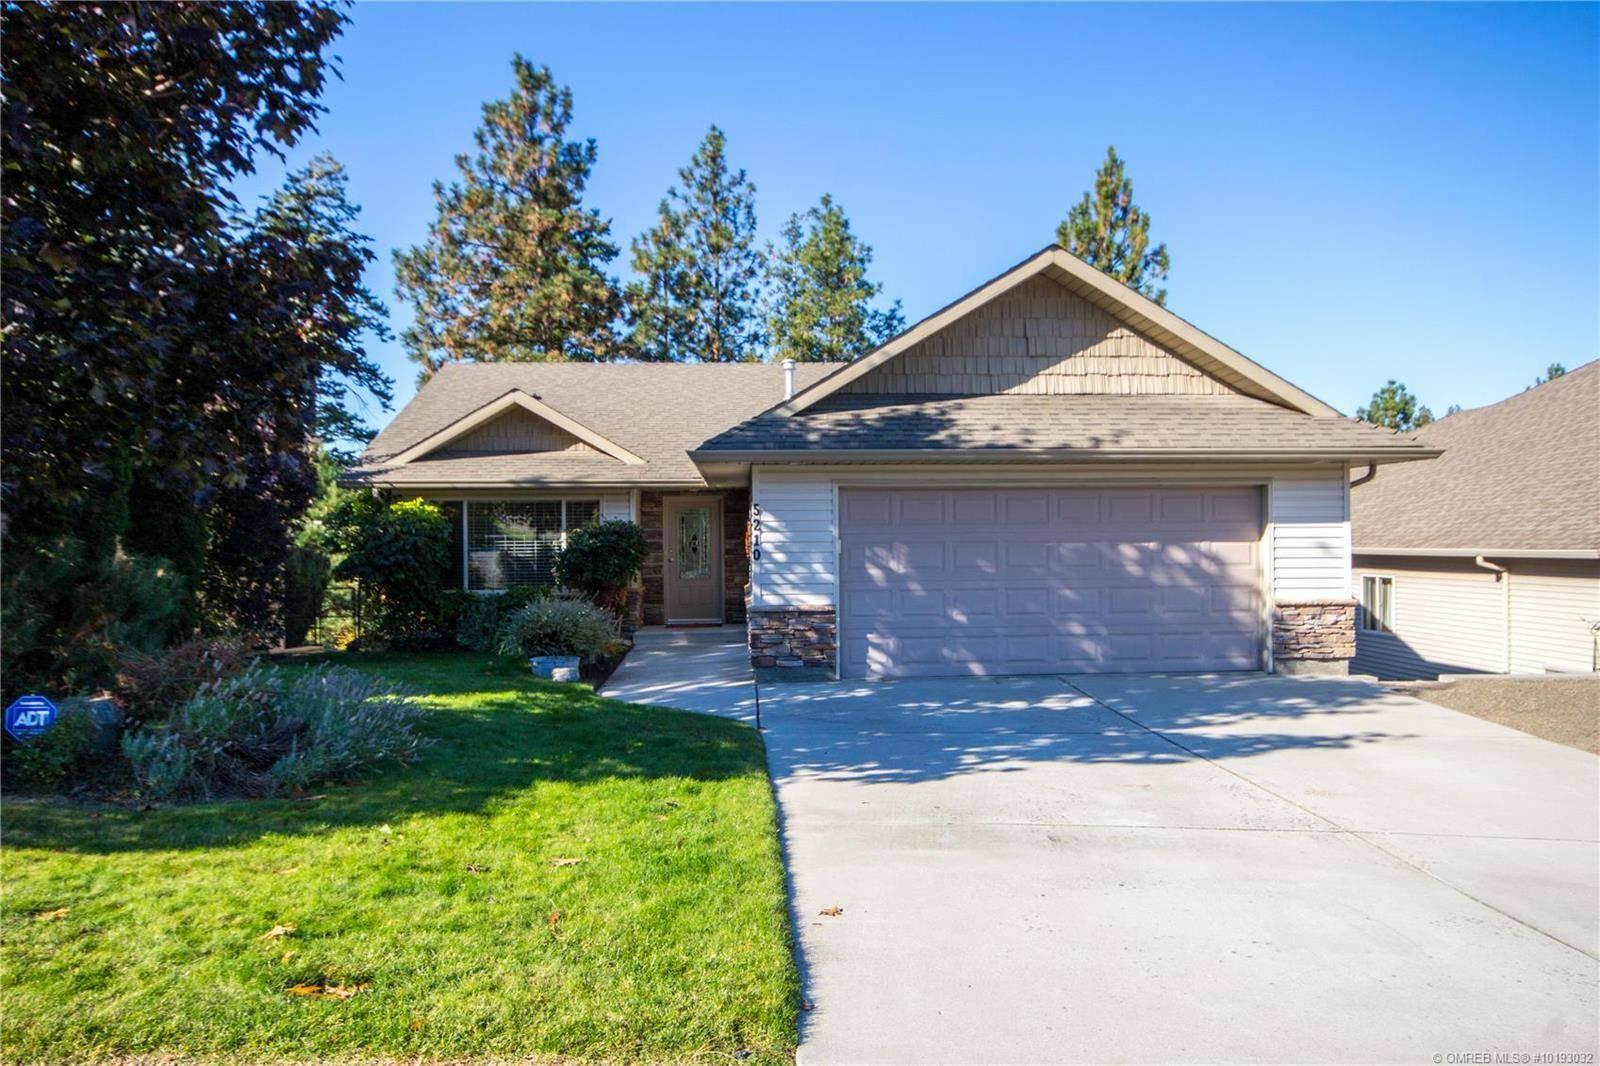 House for sale at 5210 Cobble Ct Kelowna British Columbia - MLS: 10193032